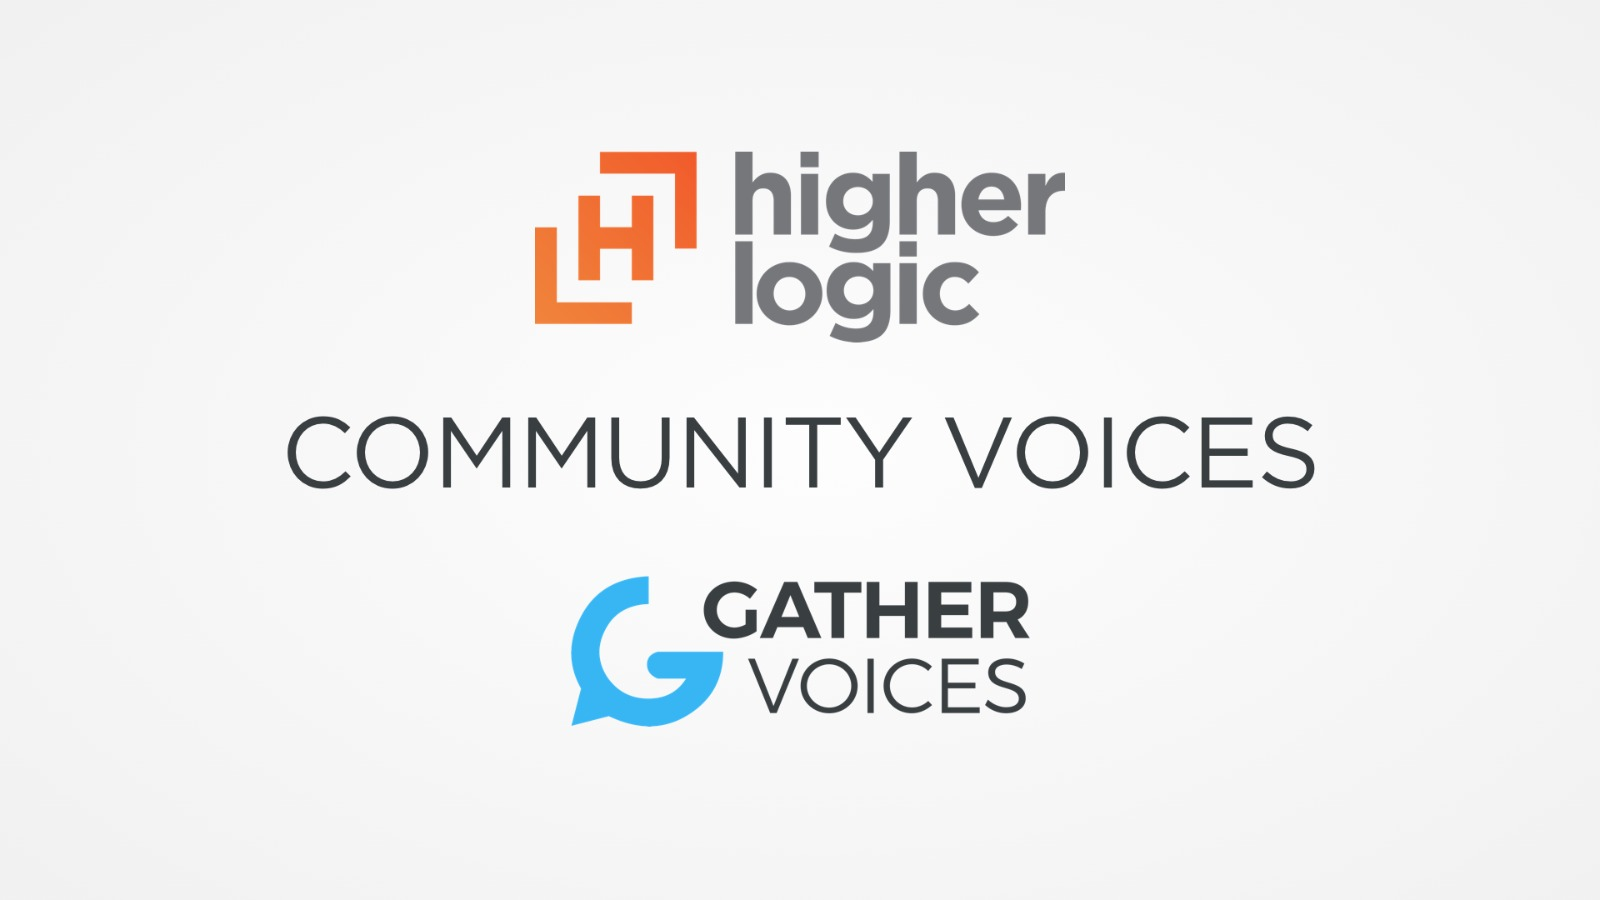 Higher Logic Communities Now Support Video Messaging